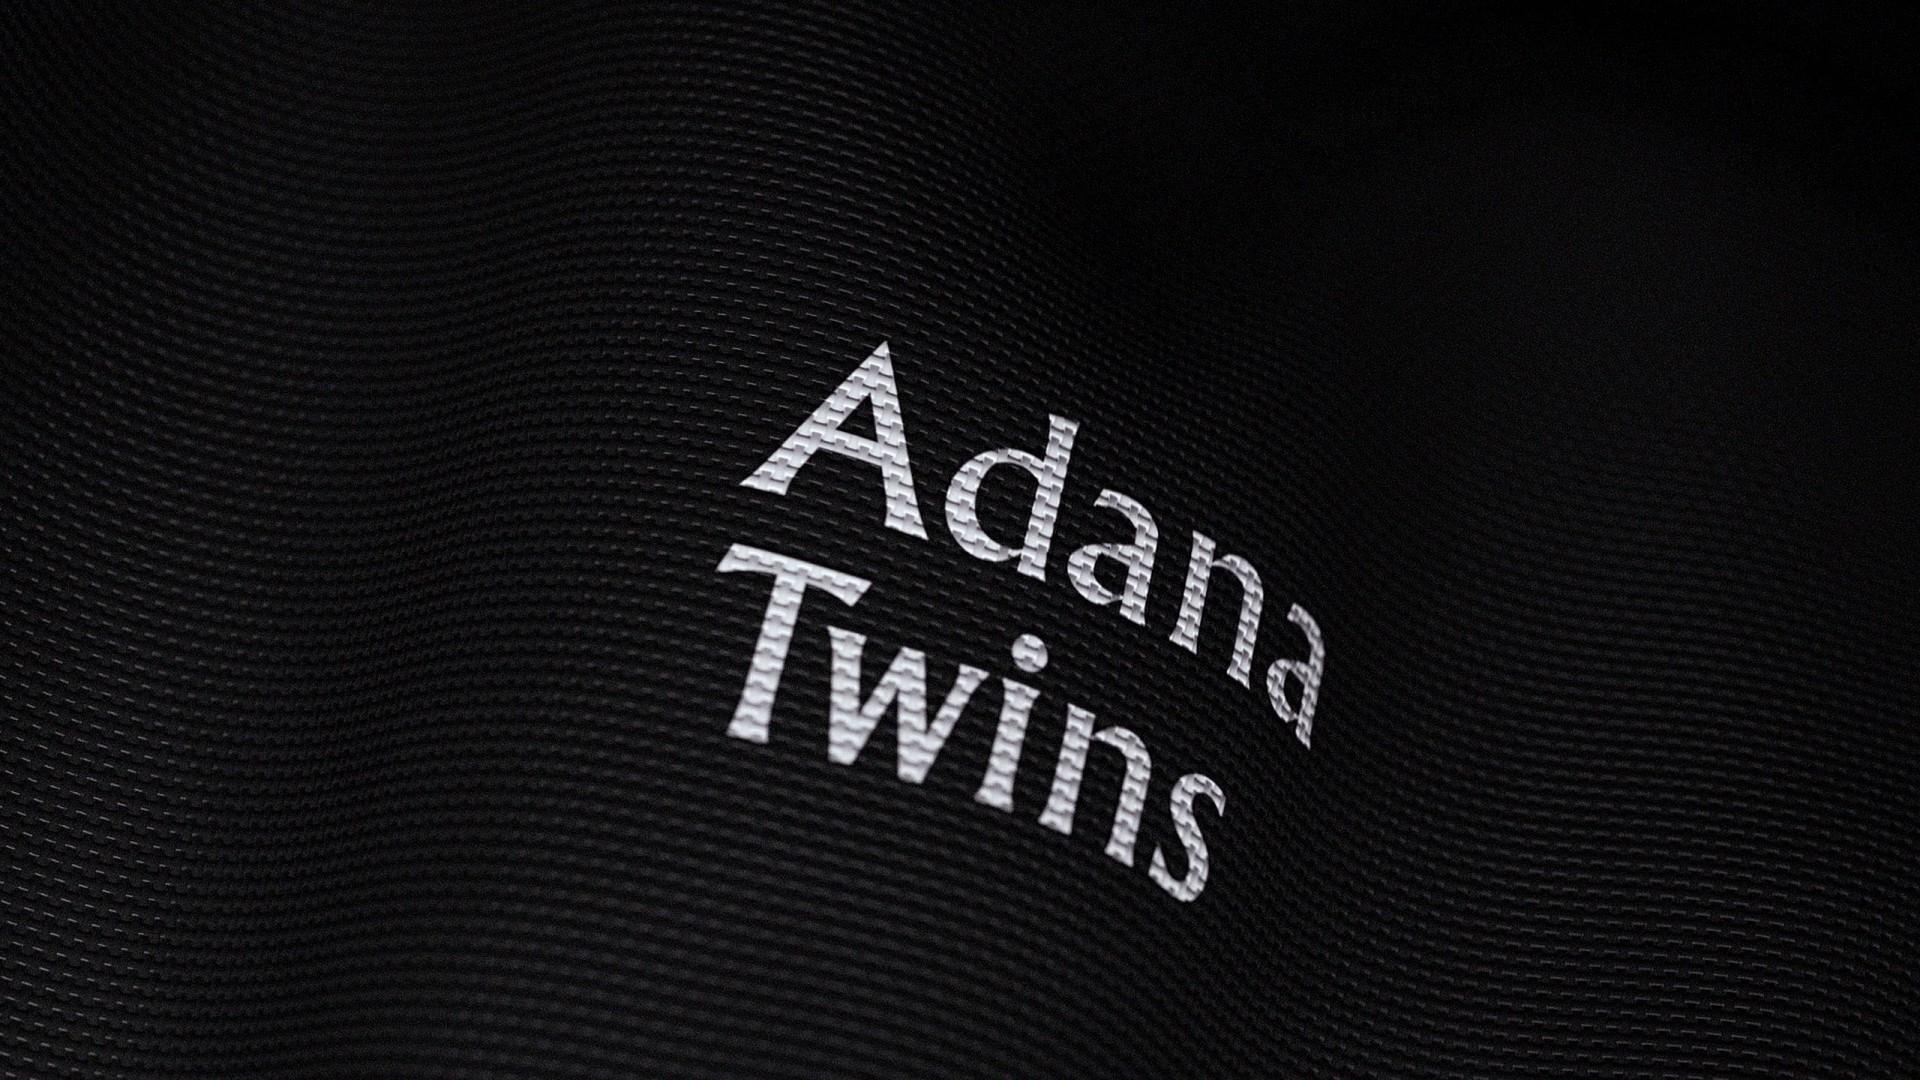 GEORG FASSWALD ADANA TWINS 16/17